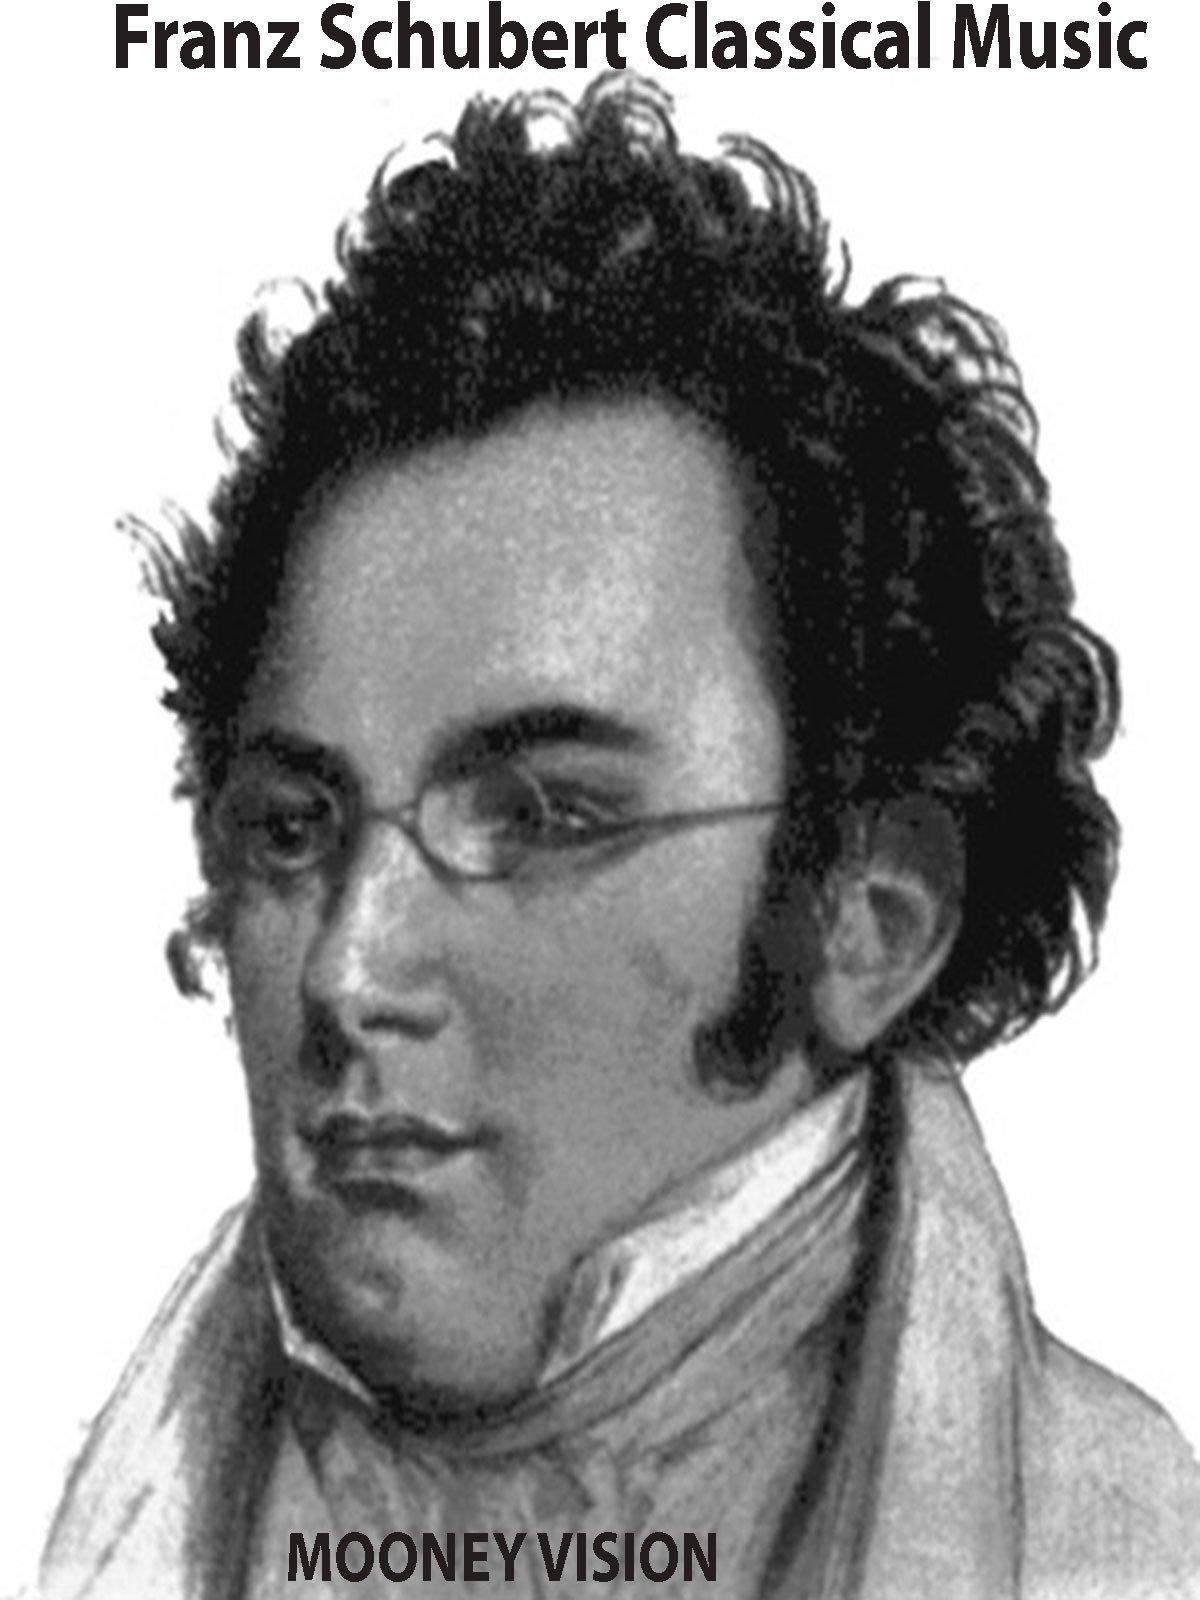 Franz Schubert Classical Music on Amazon Prime Instant Video UK